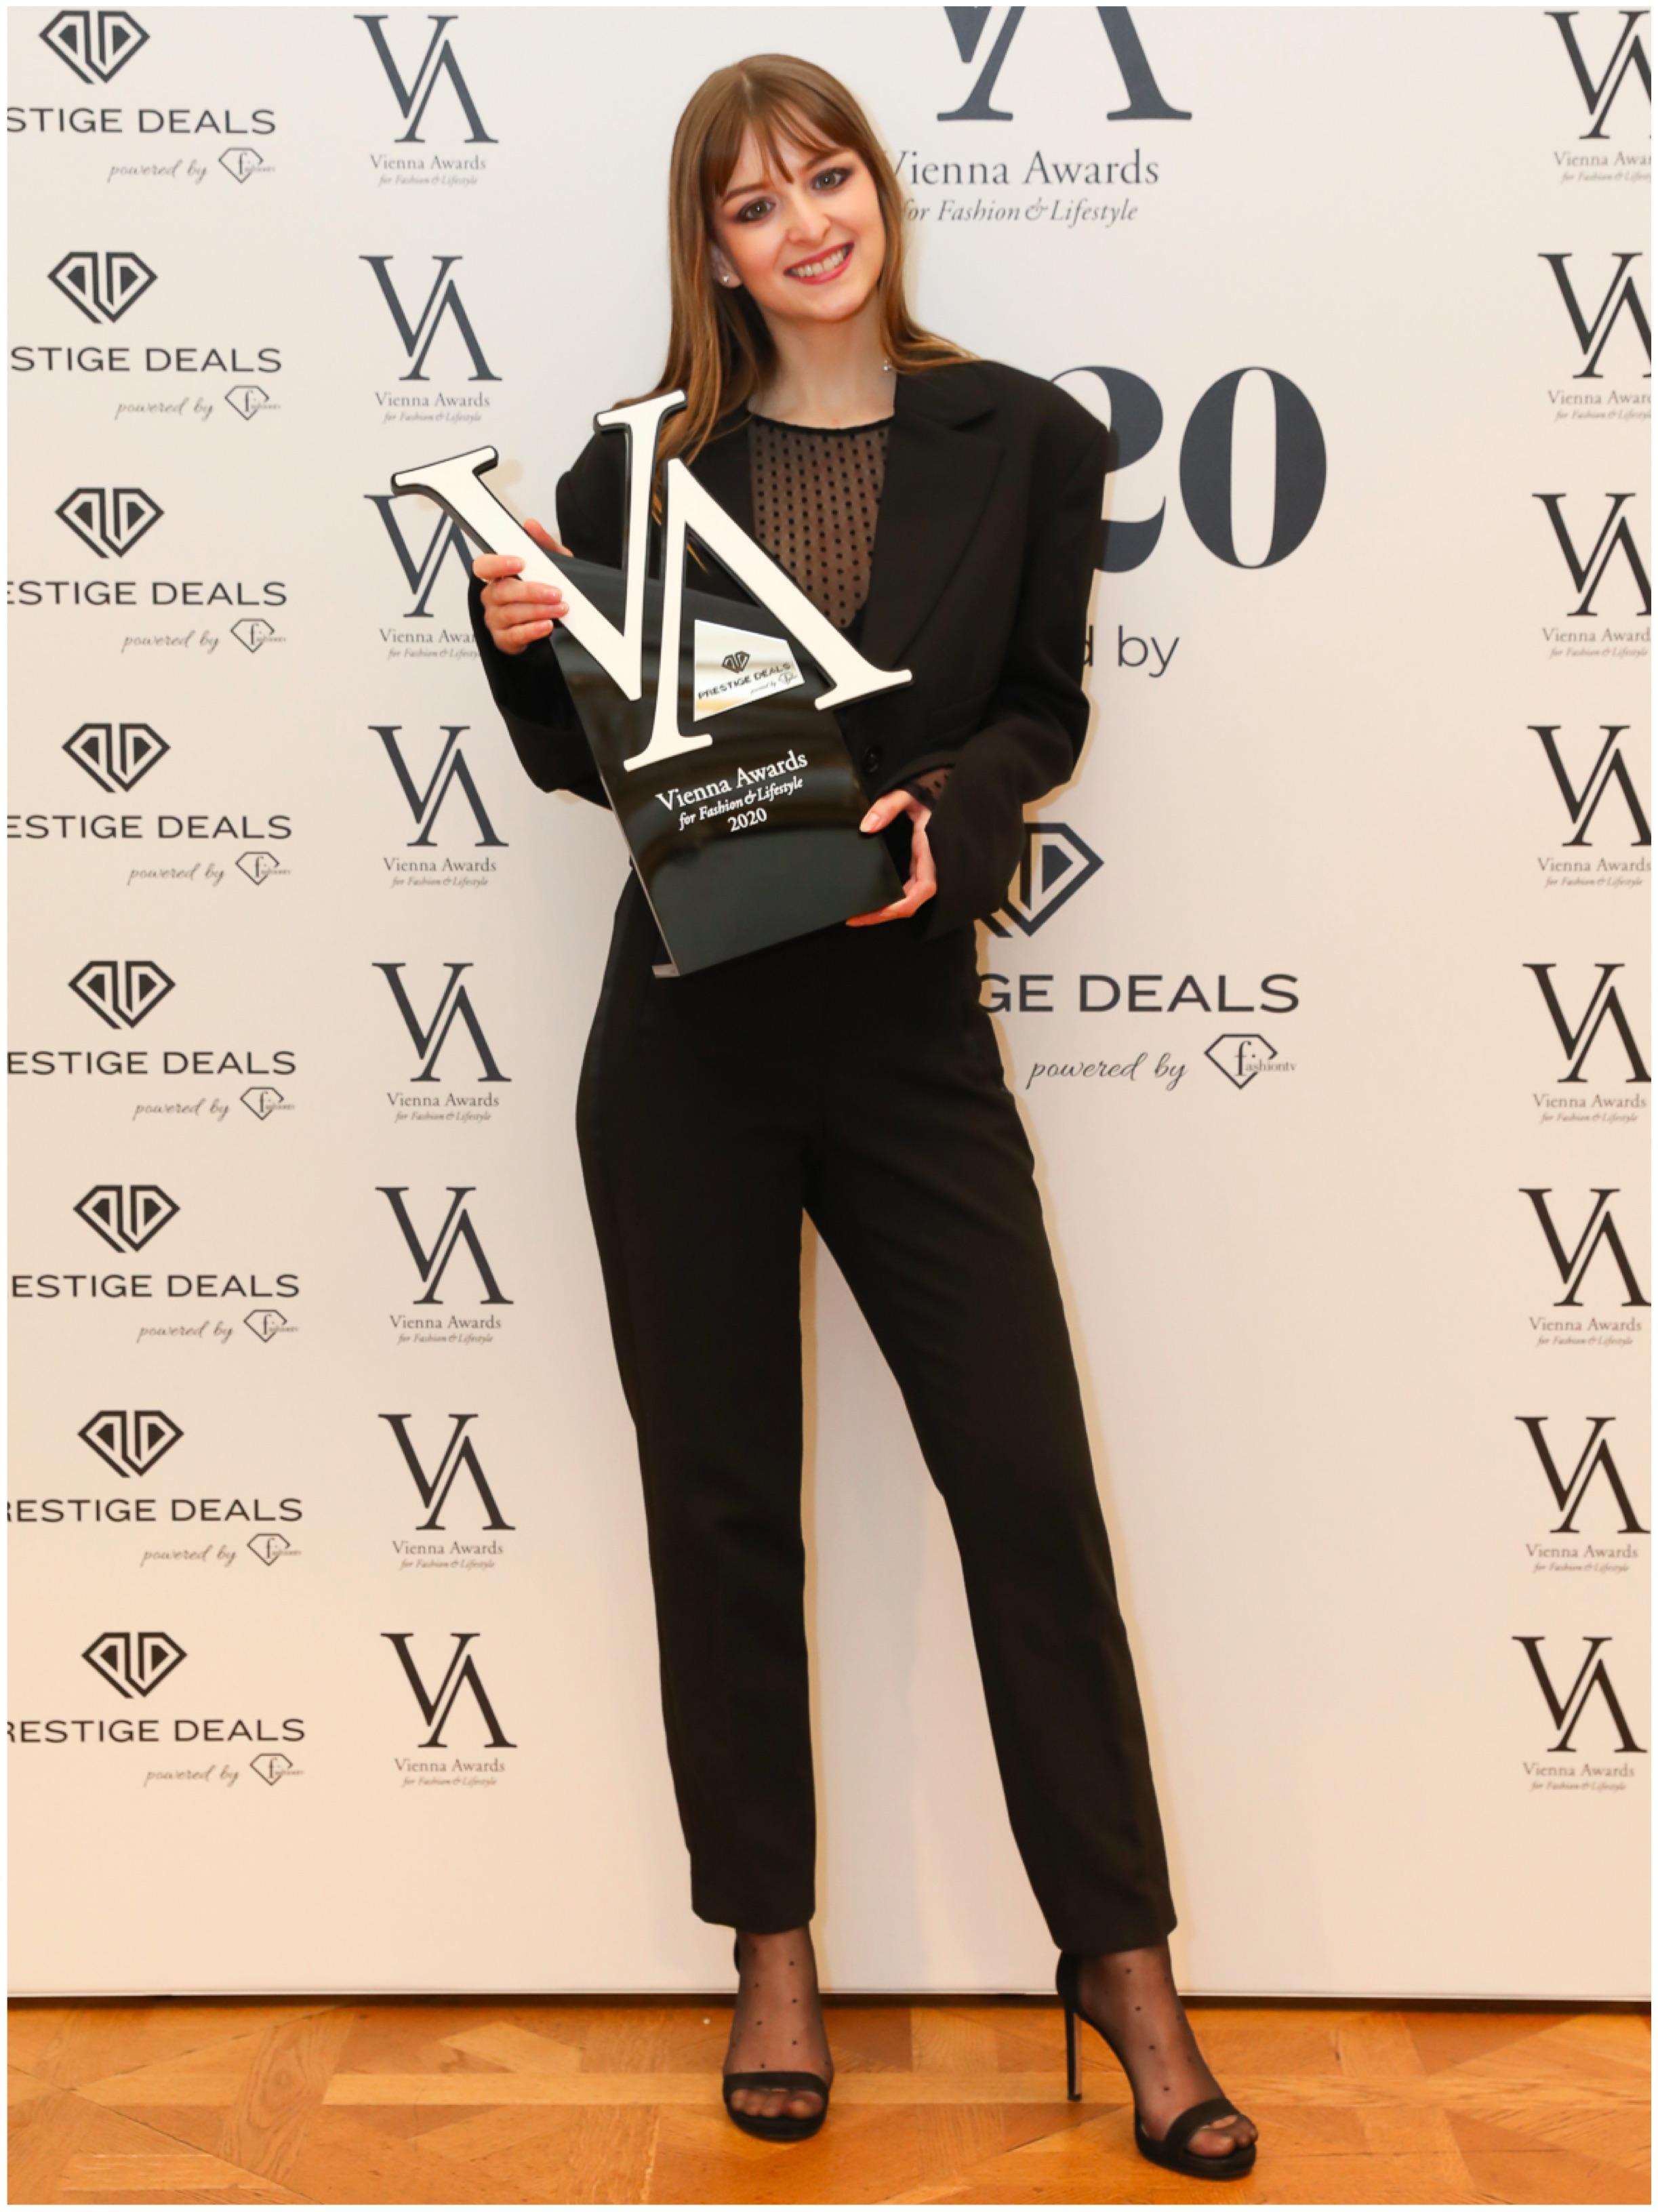 Stylist of the Year 2020: NADINE GURTNER